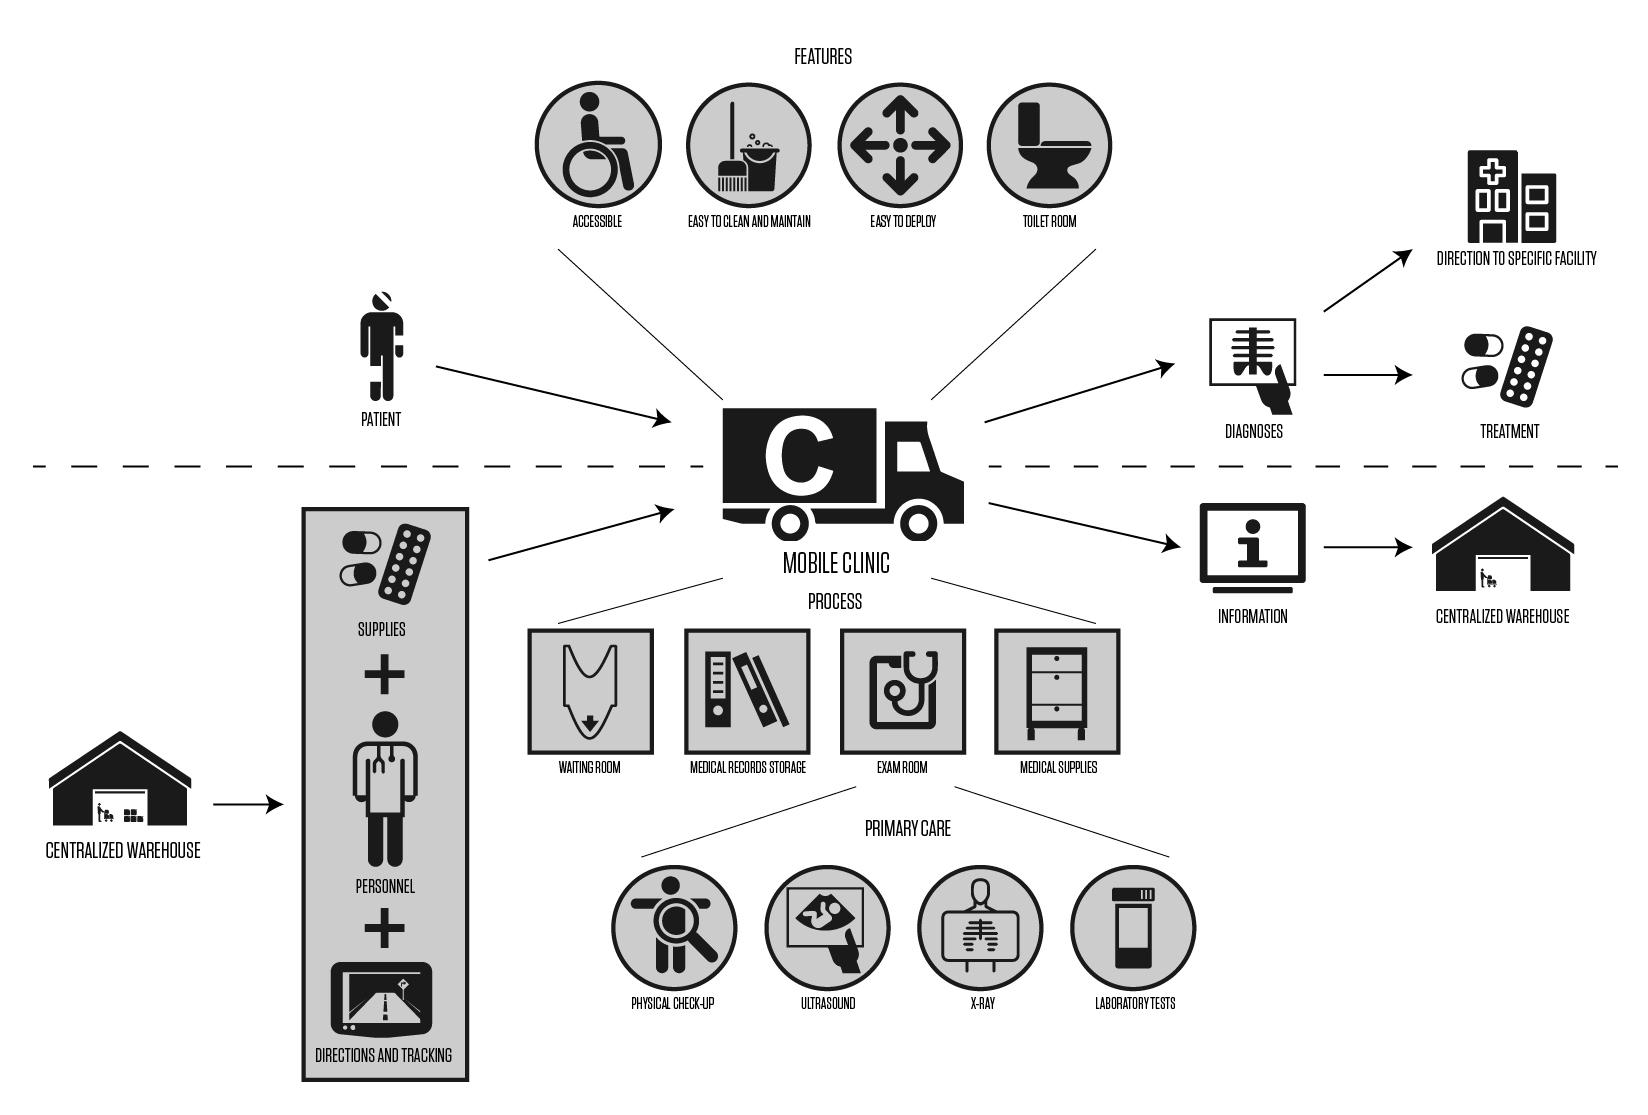 Mobile Clinic Diagram